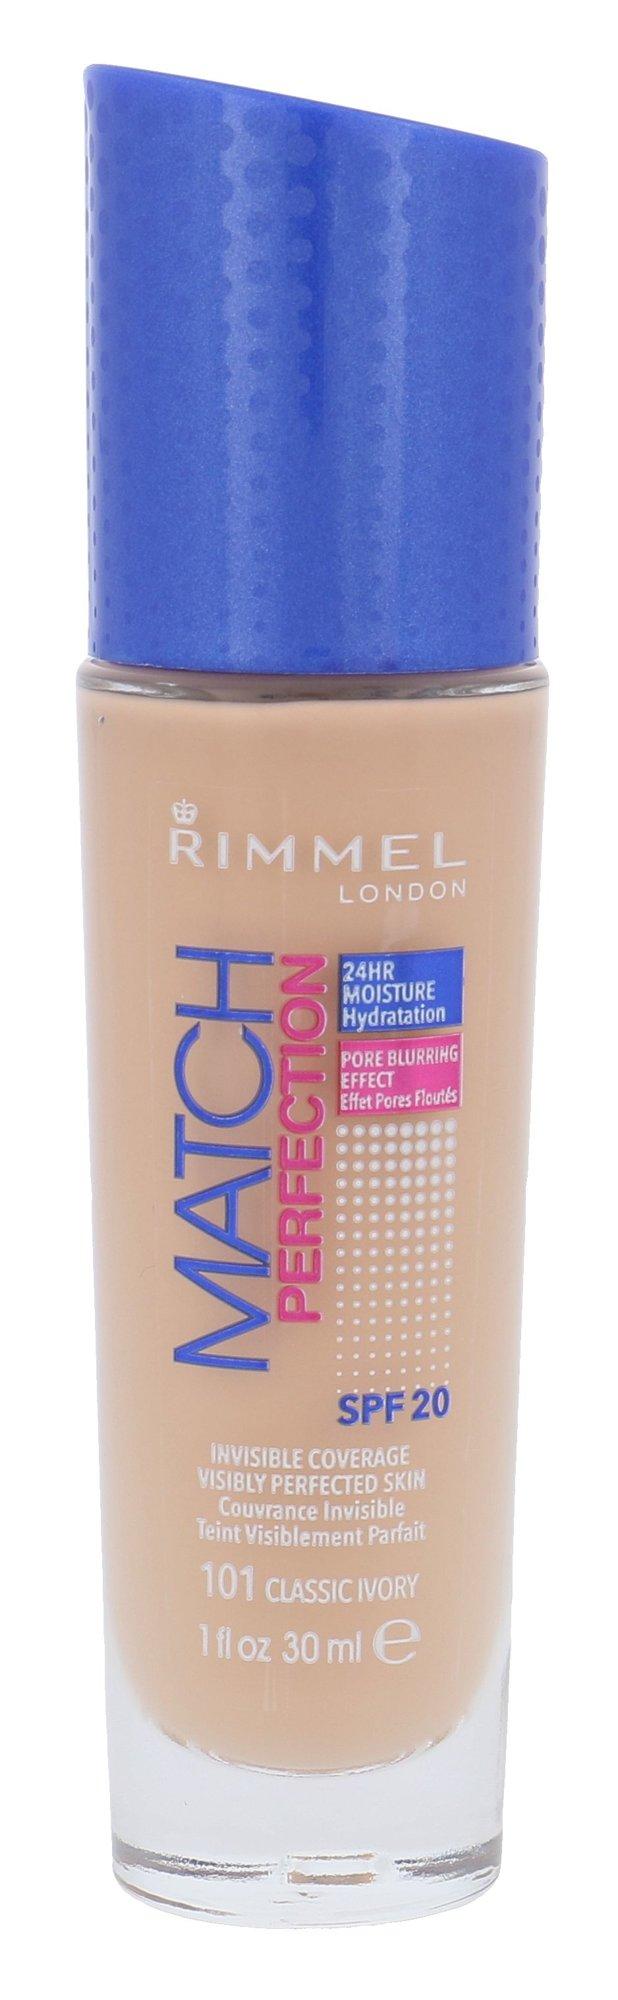 Rimmel London Match Perfection Cosmetic 30ml 101 Classic Ivory